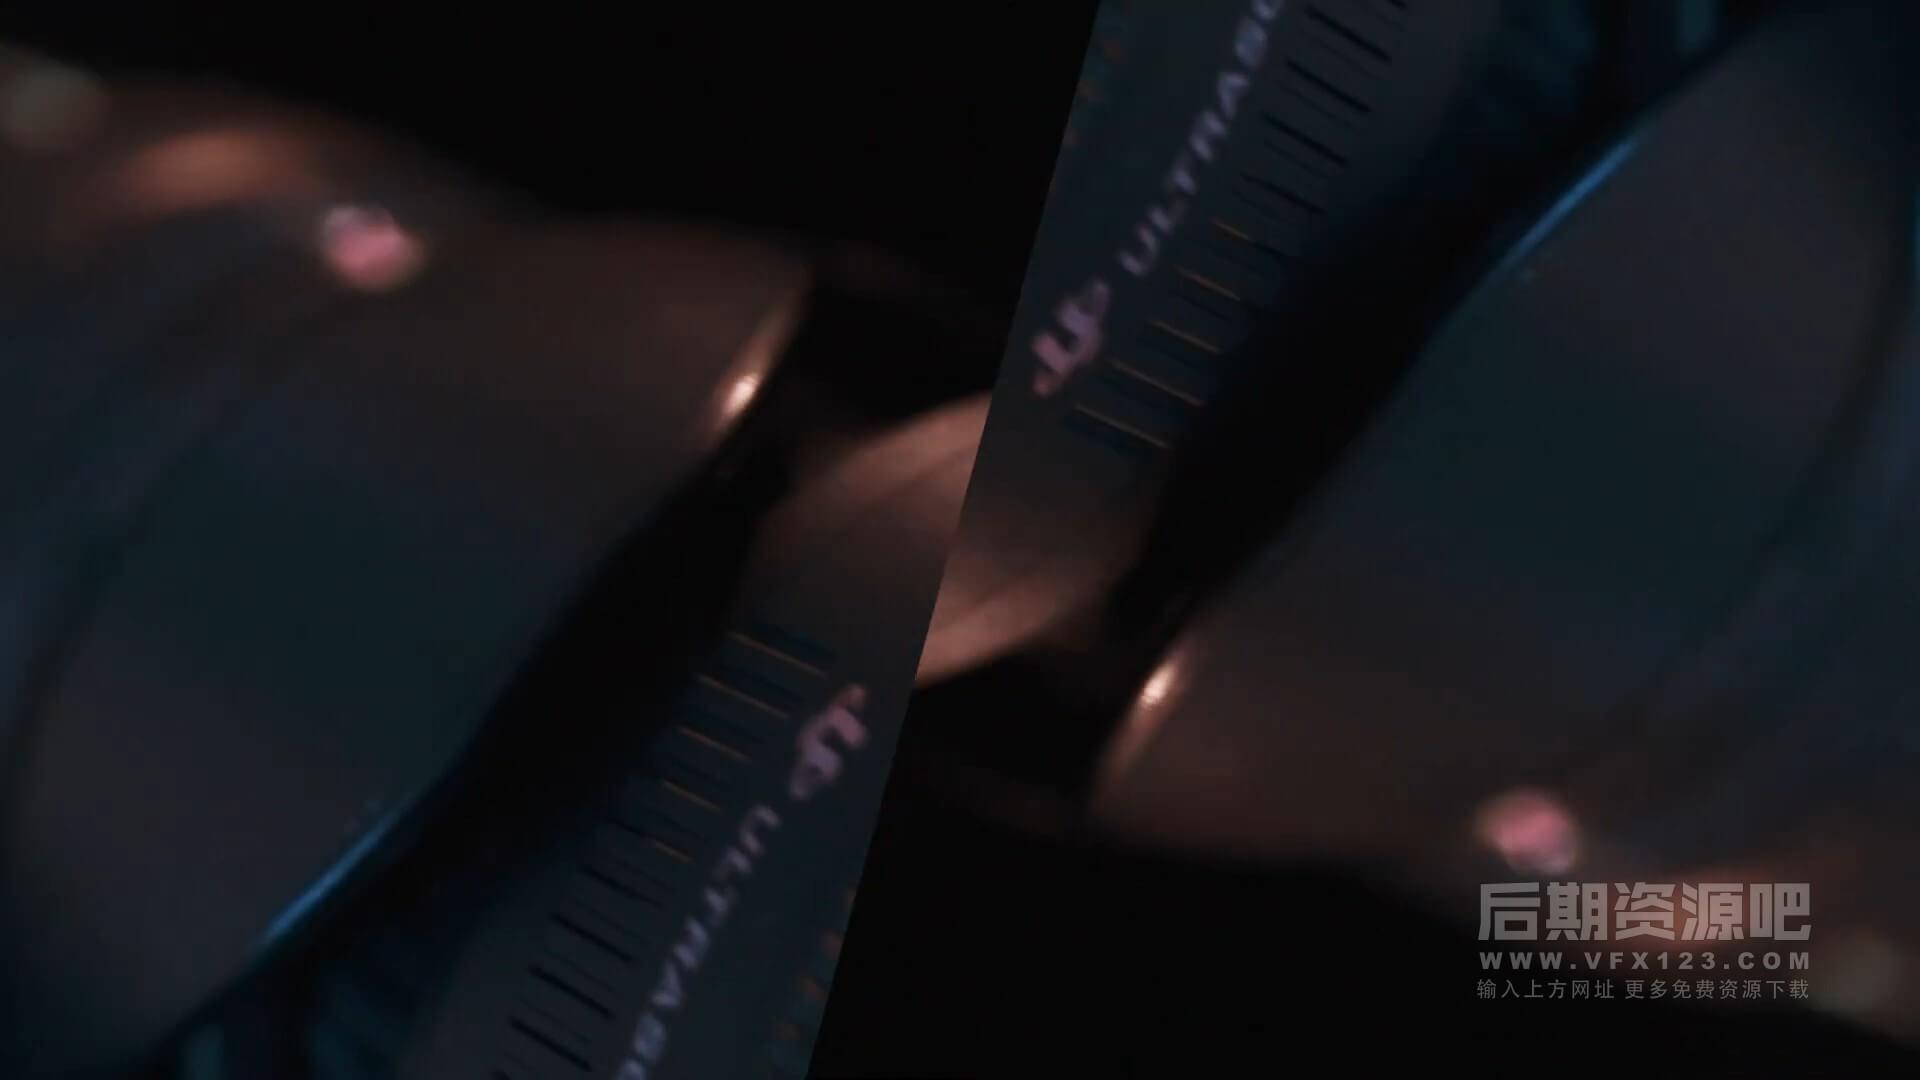 fcpx效果插件 影片添加画中画翻转分割叠加效果预设 FLIP EFFECT